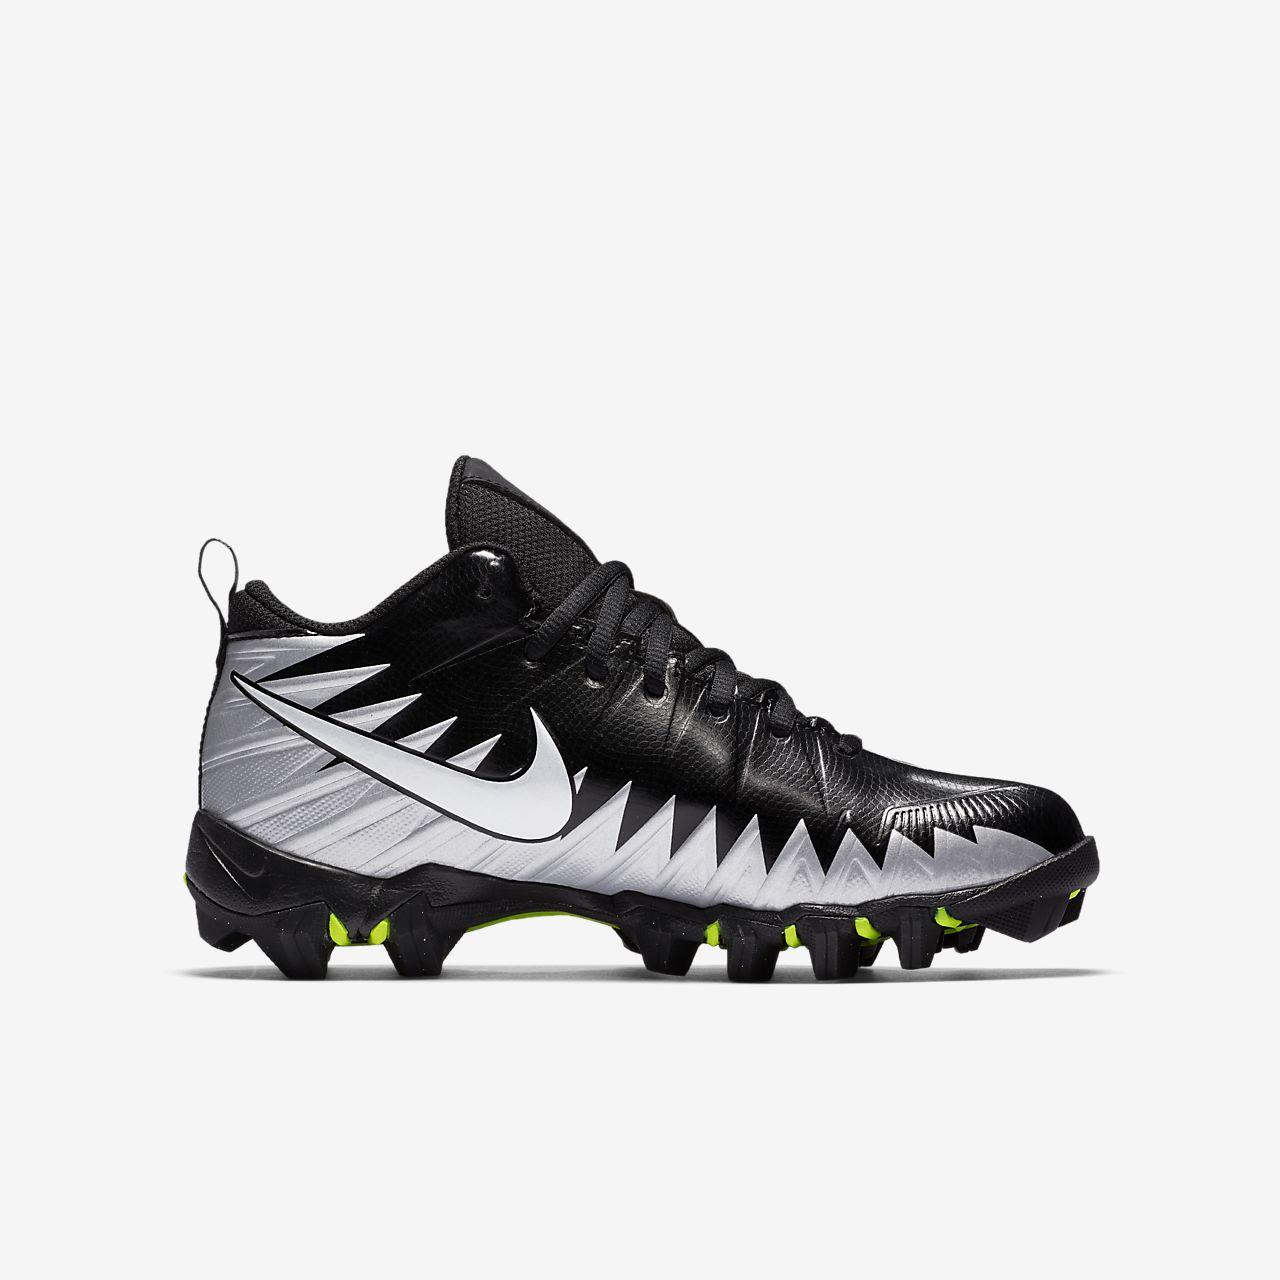 77980c658 Nike Alpha Menace Shark Little/Big Kids' Football Cleat. Nike.com